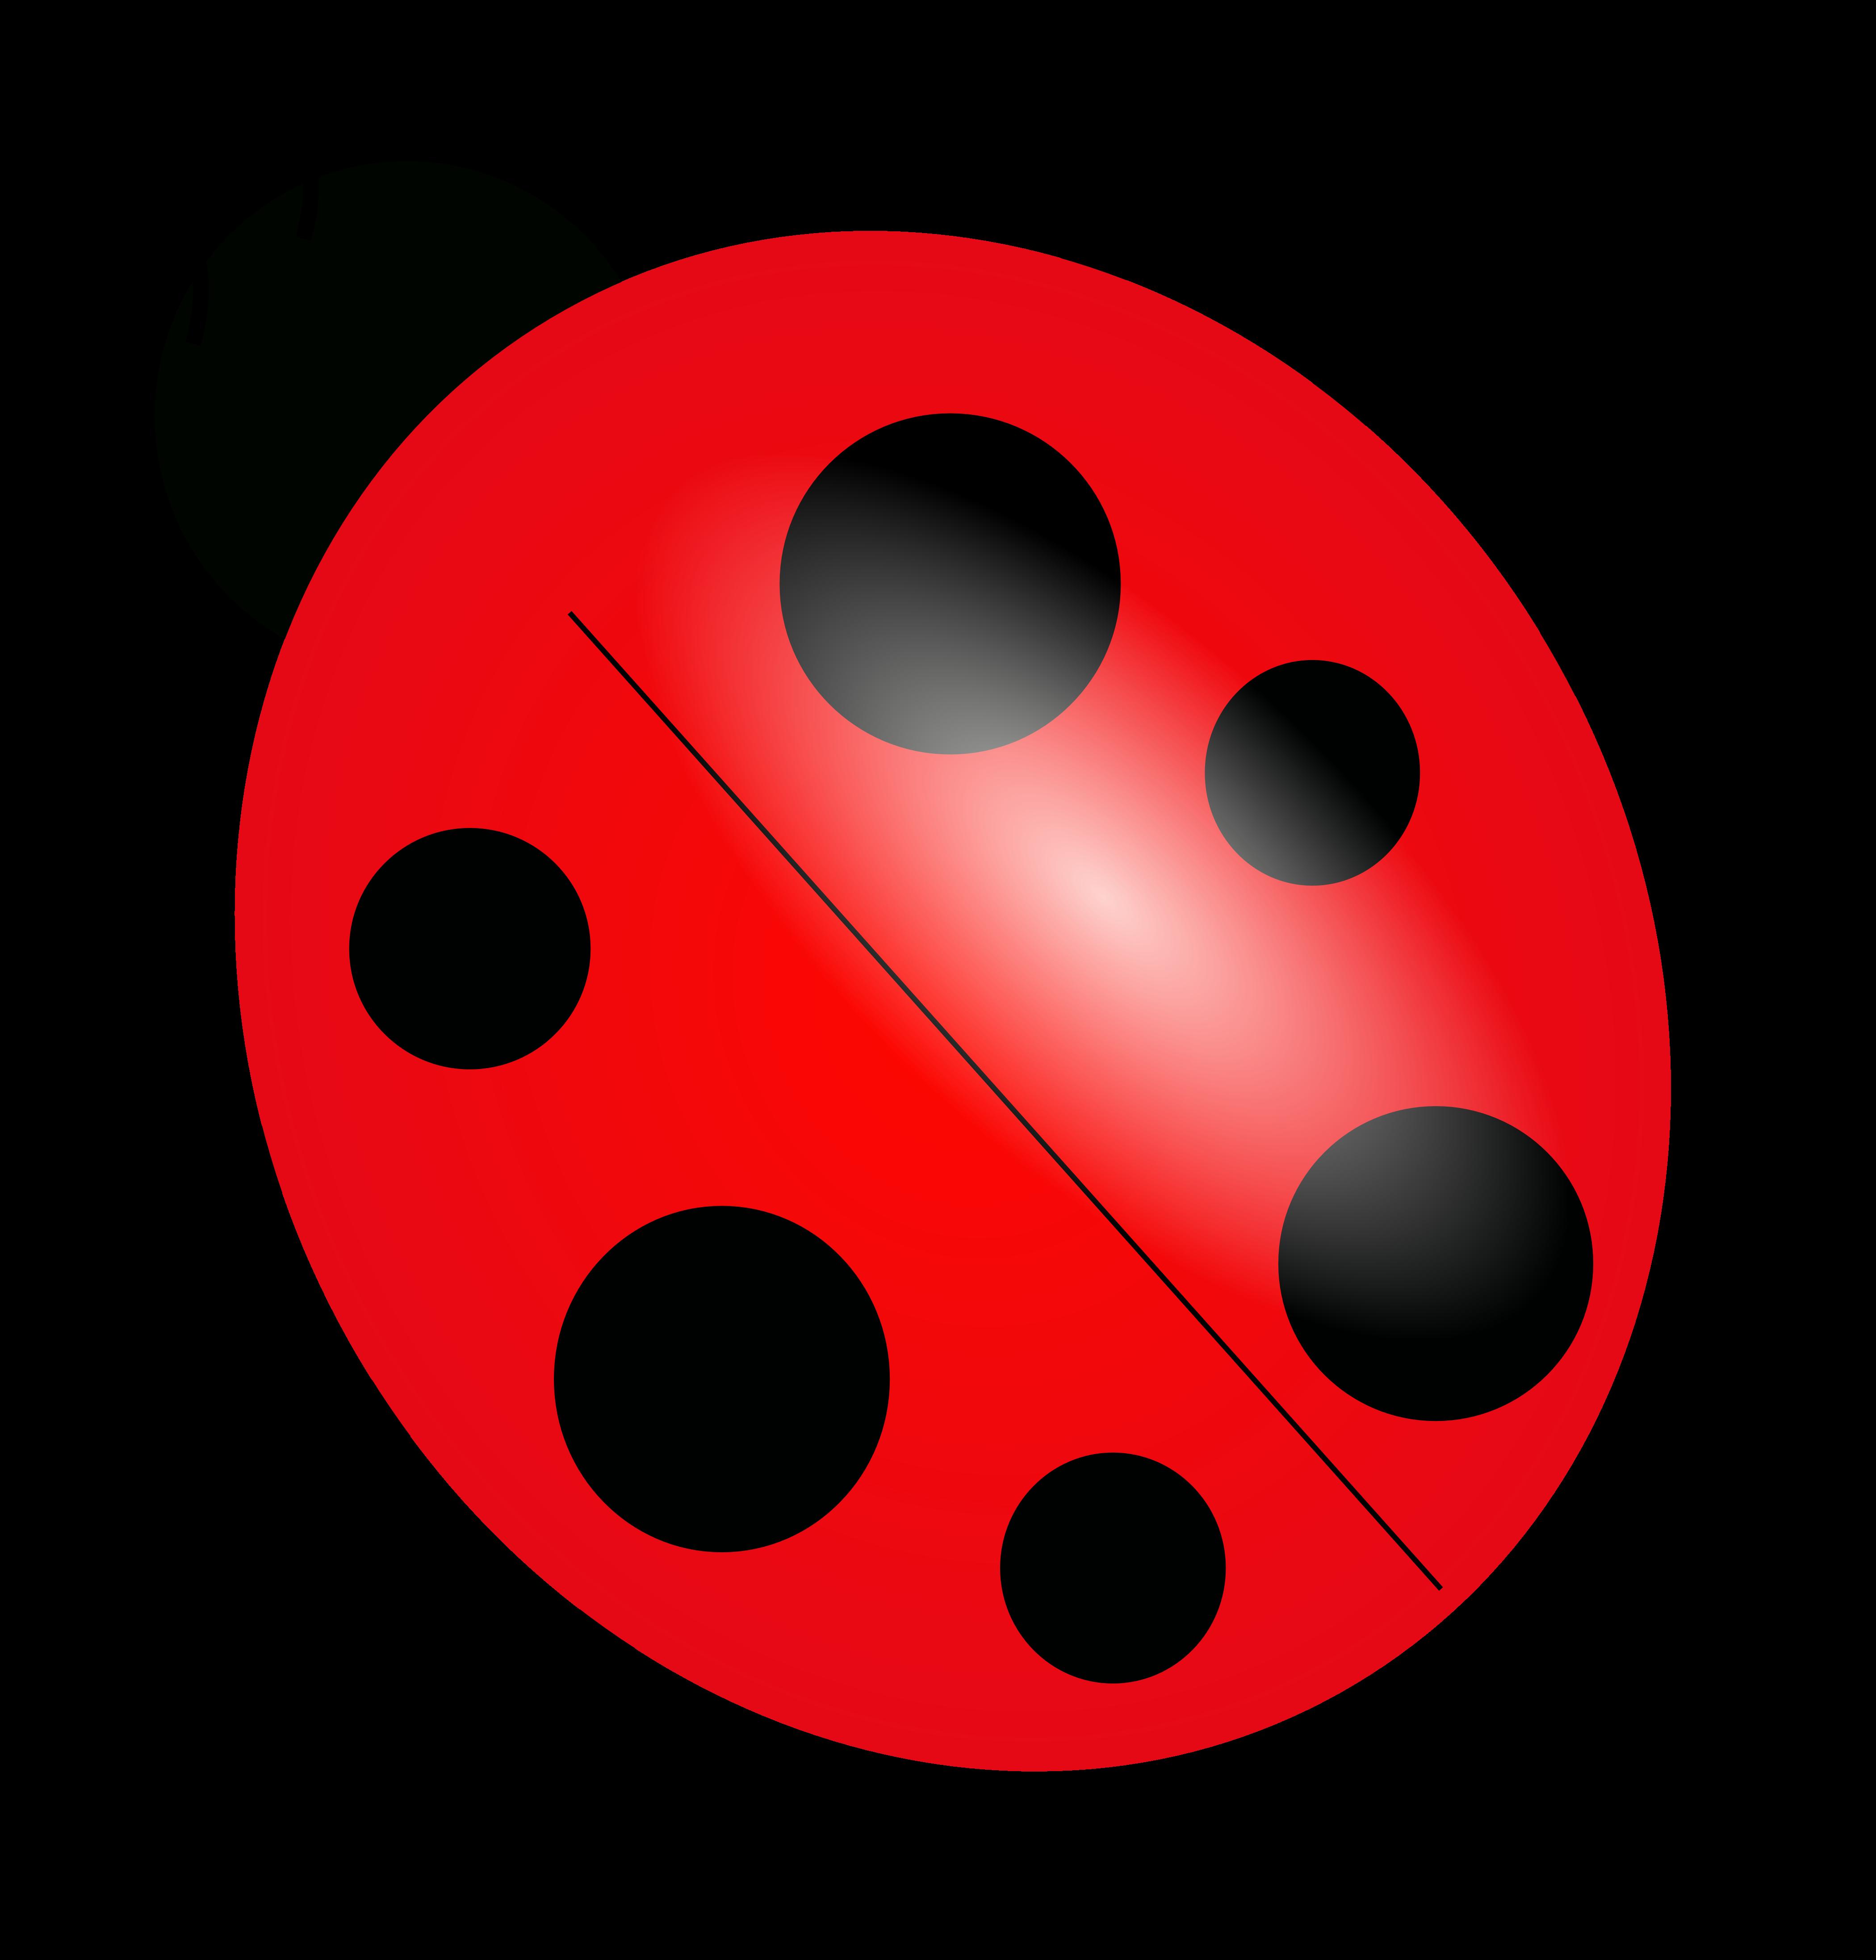 jpg library download Rinr yabt png ladybug. Ladybugs clipart let's celebrate